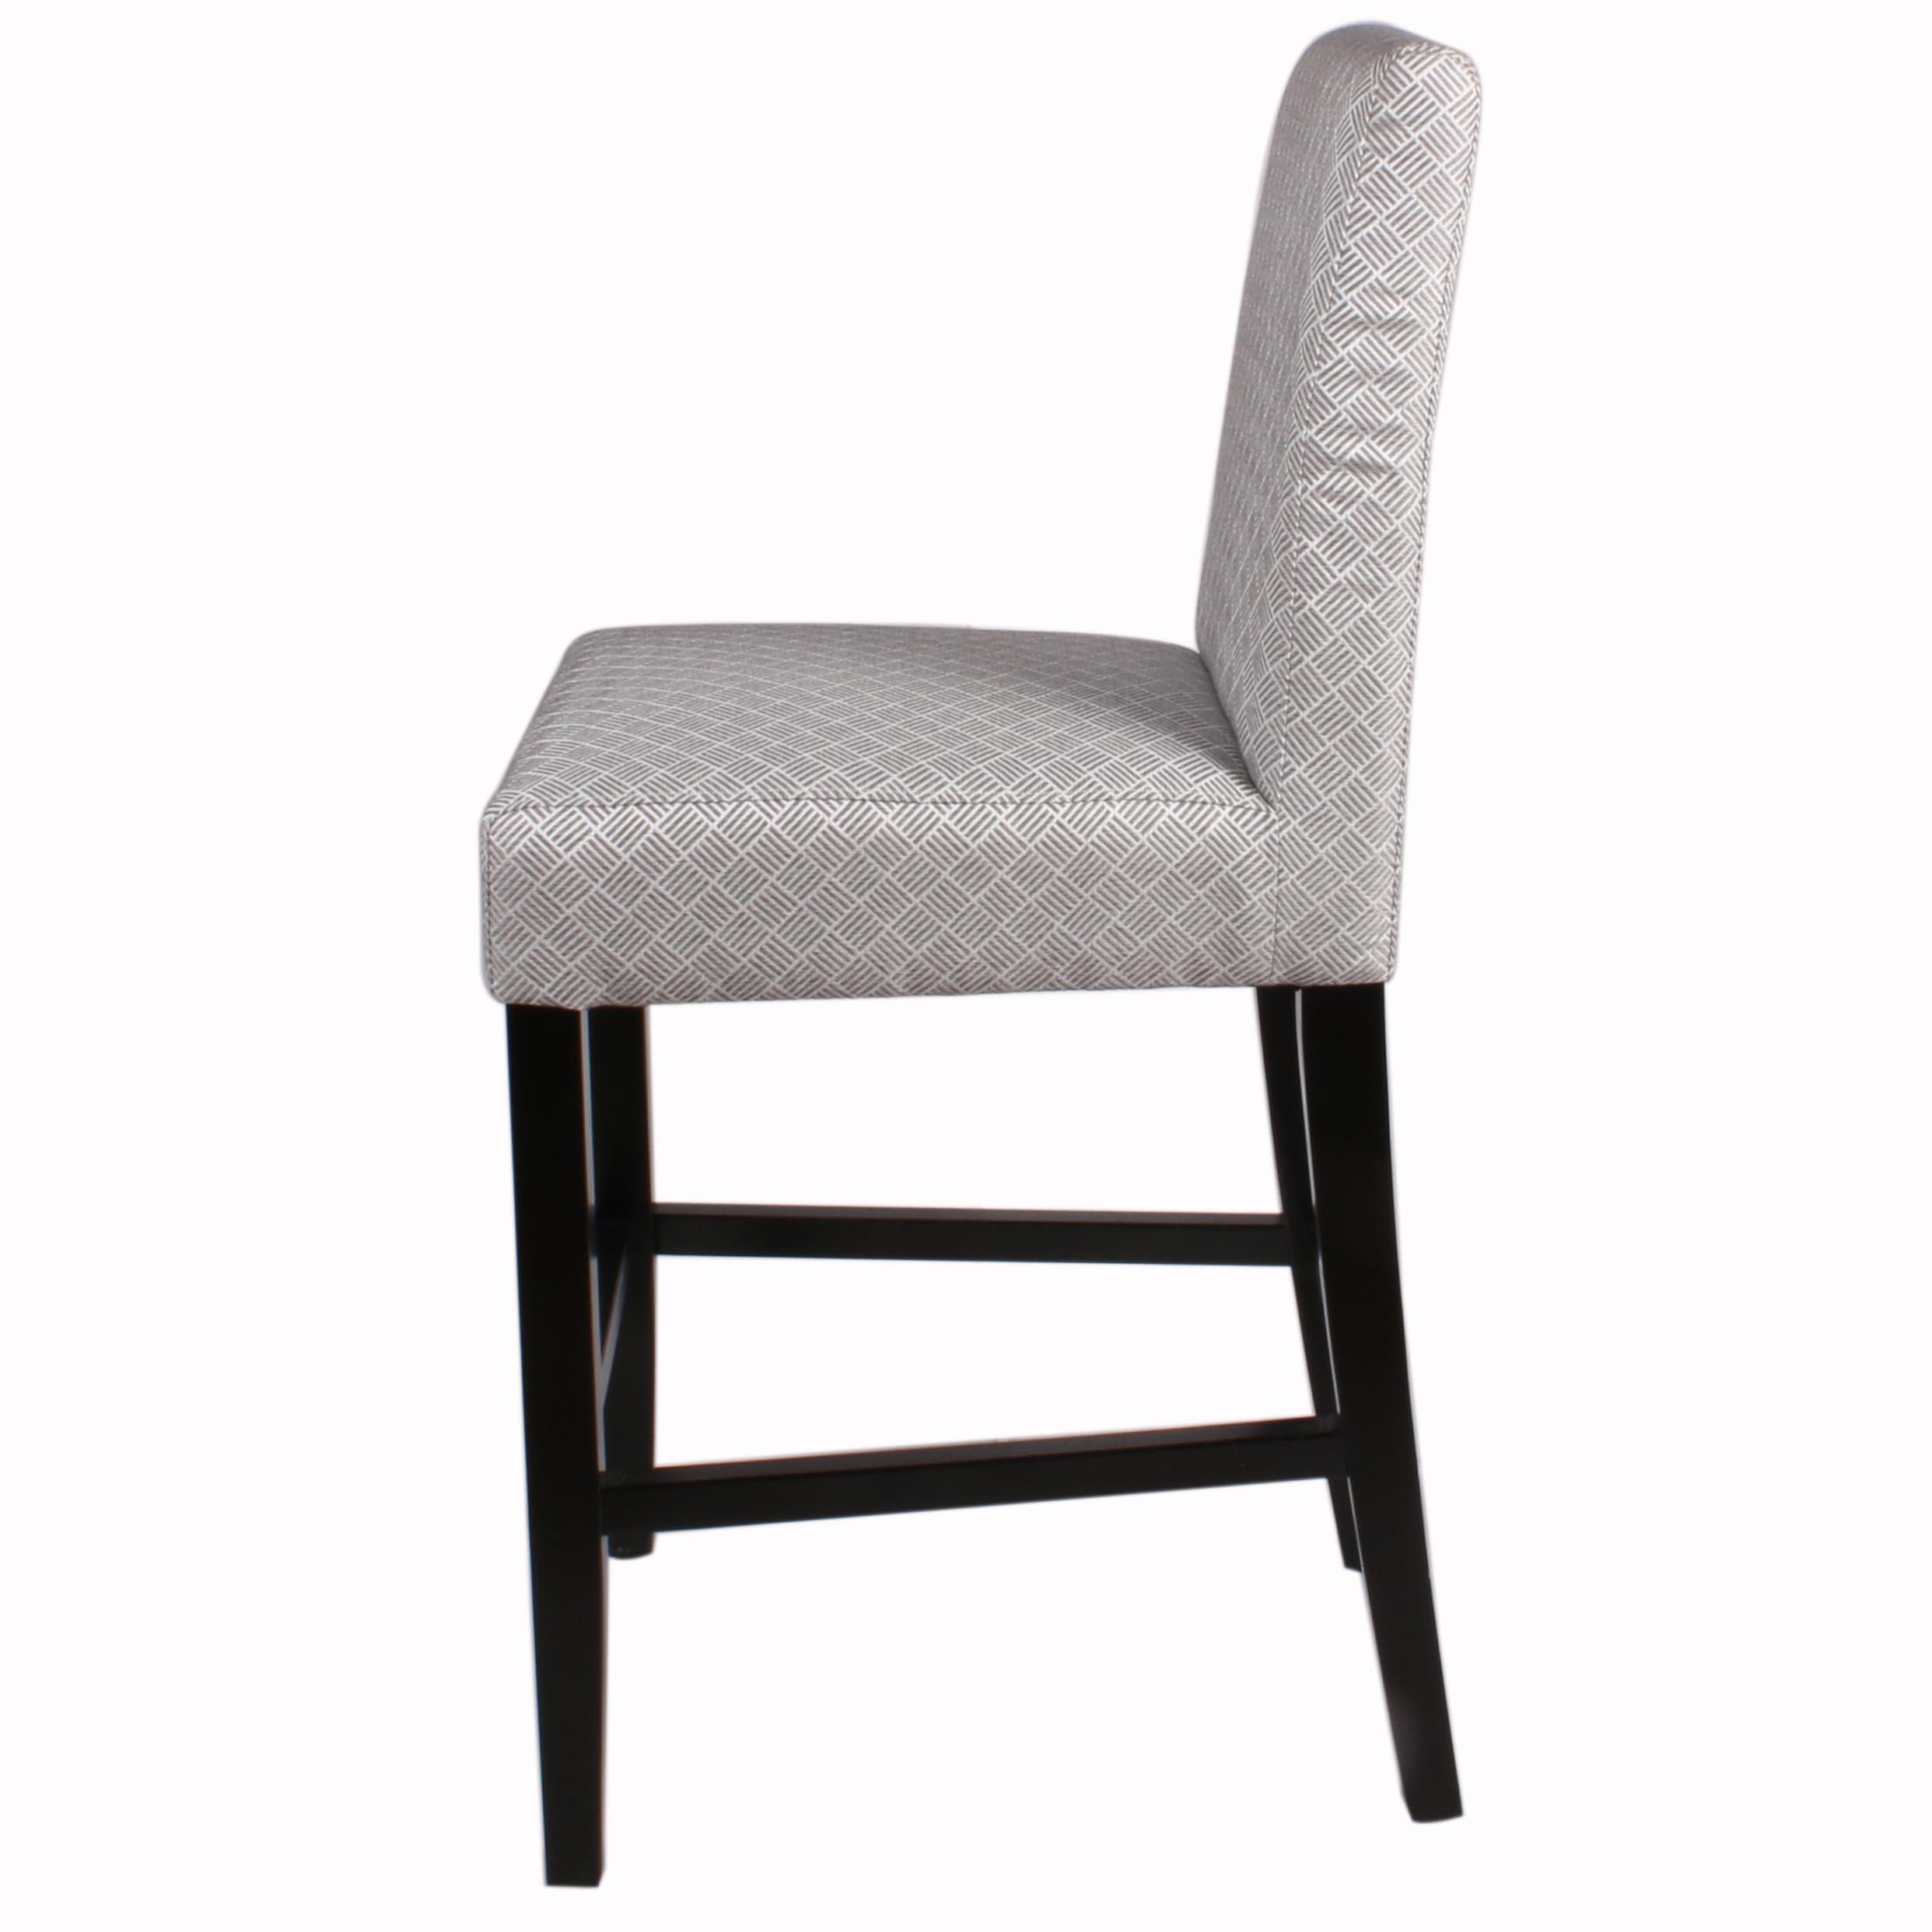 Admirable Hartford Fabric Counter Stool Black Legs Basket Weave Gray Lamtechconsult Wood Chair Design Ideas Lamtechconsultcom